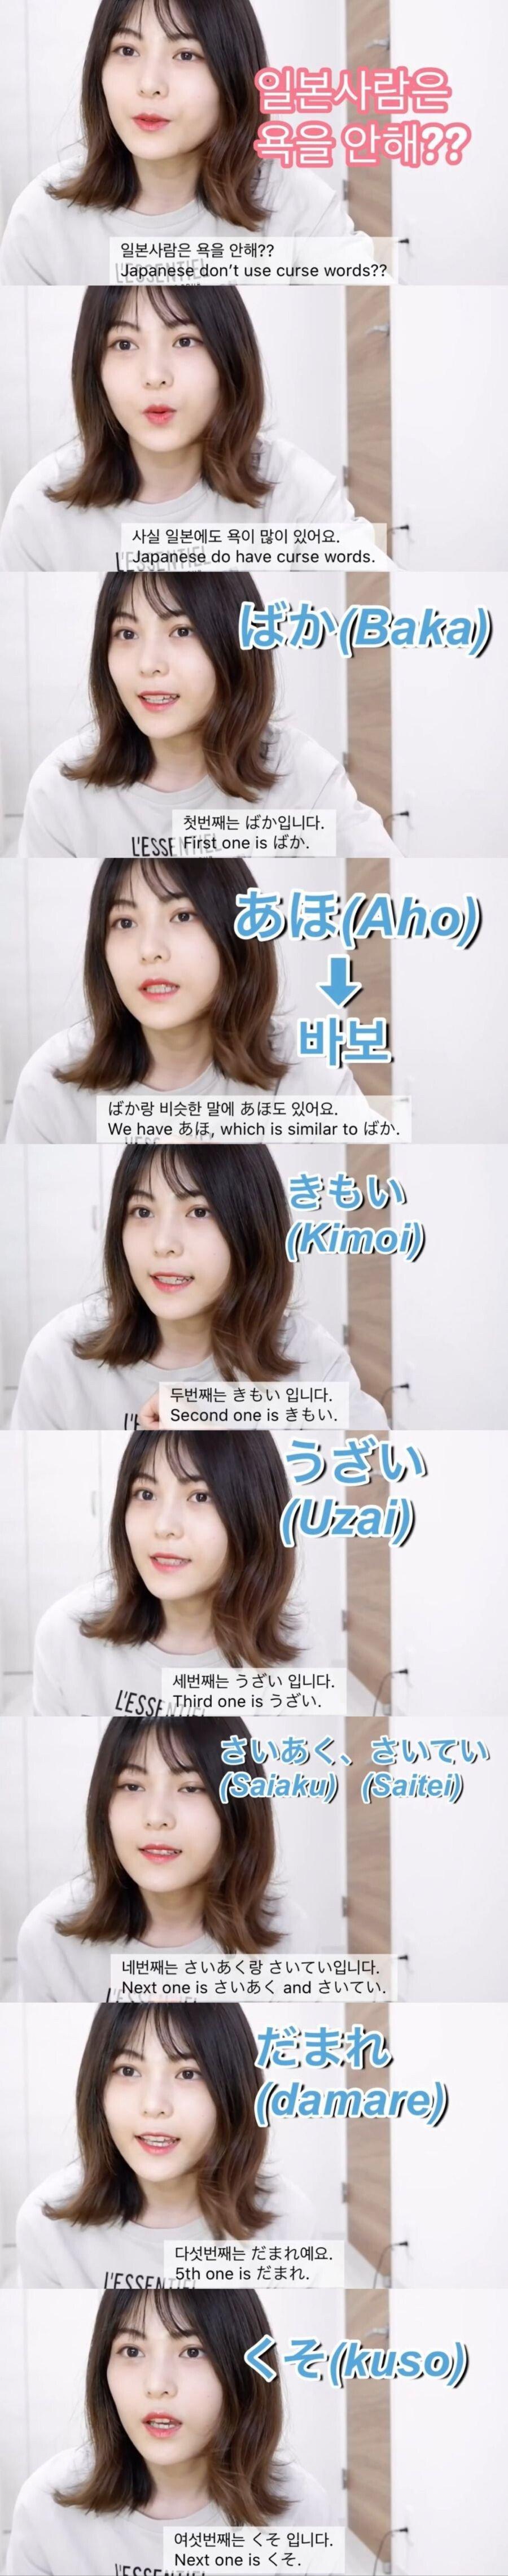 111.jpg 일본 유투버가 알려주는 일본욕